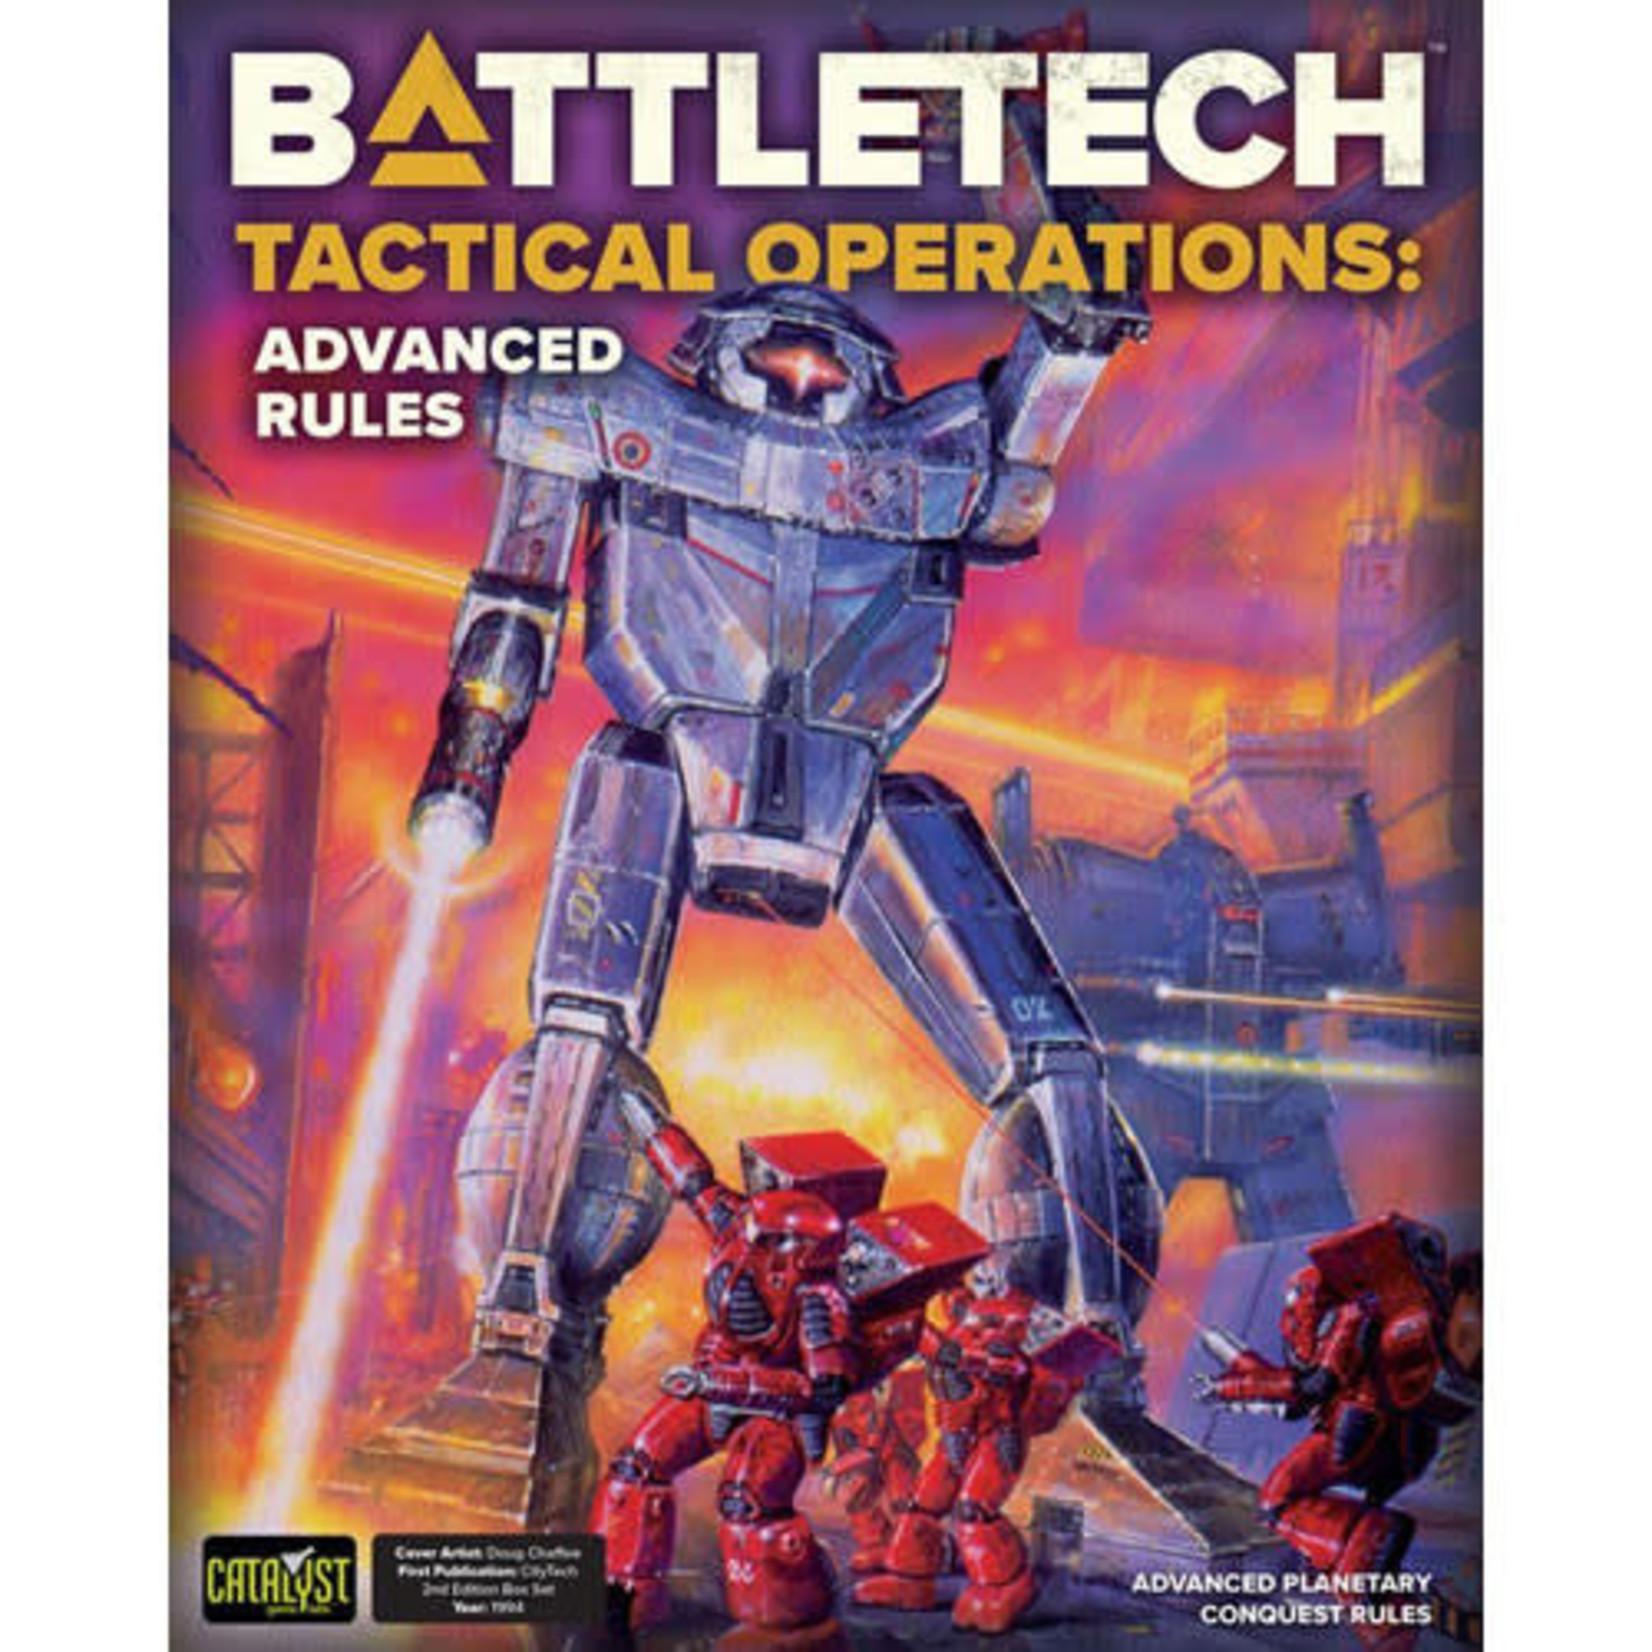 BattletechTactical Operations Advanced Rules